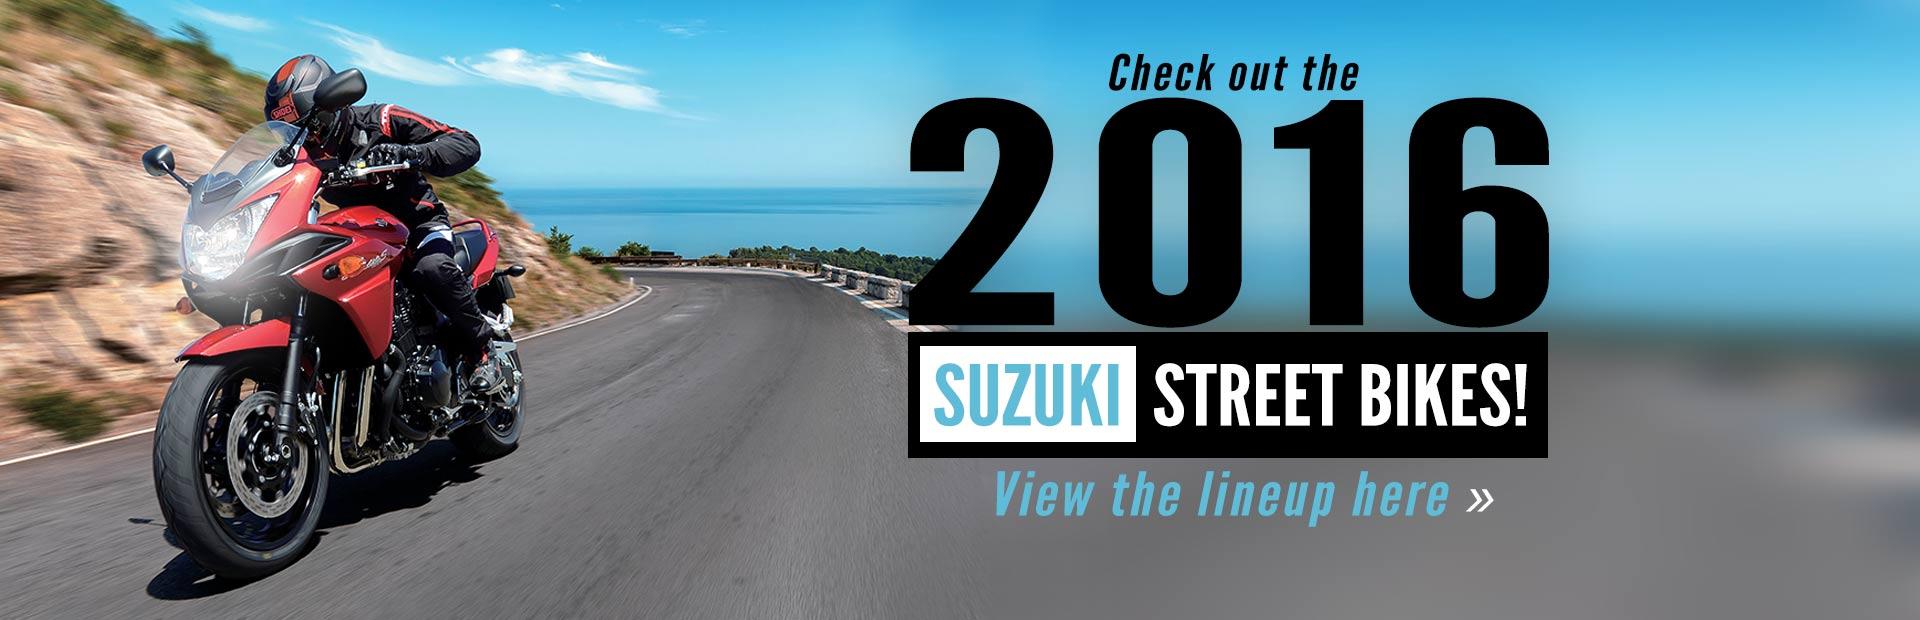 2016 Suzuki Street Bikes: Click here to view the models.